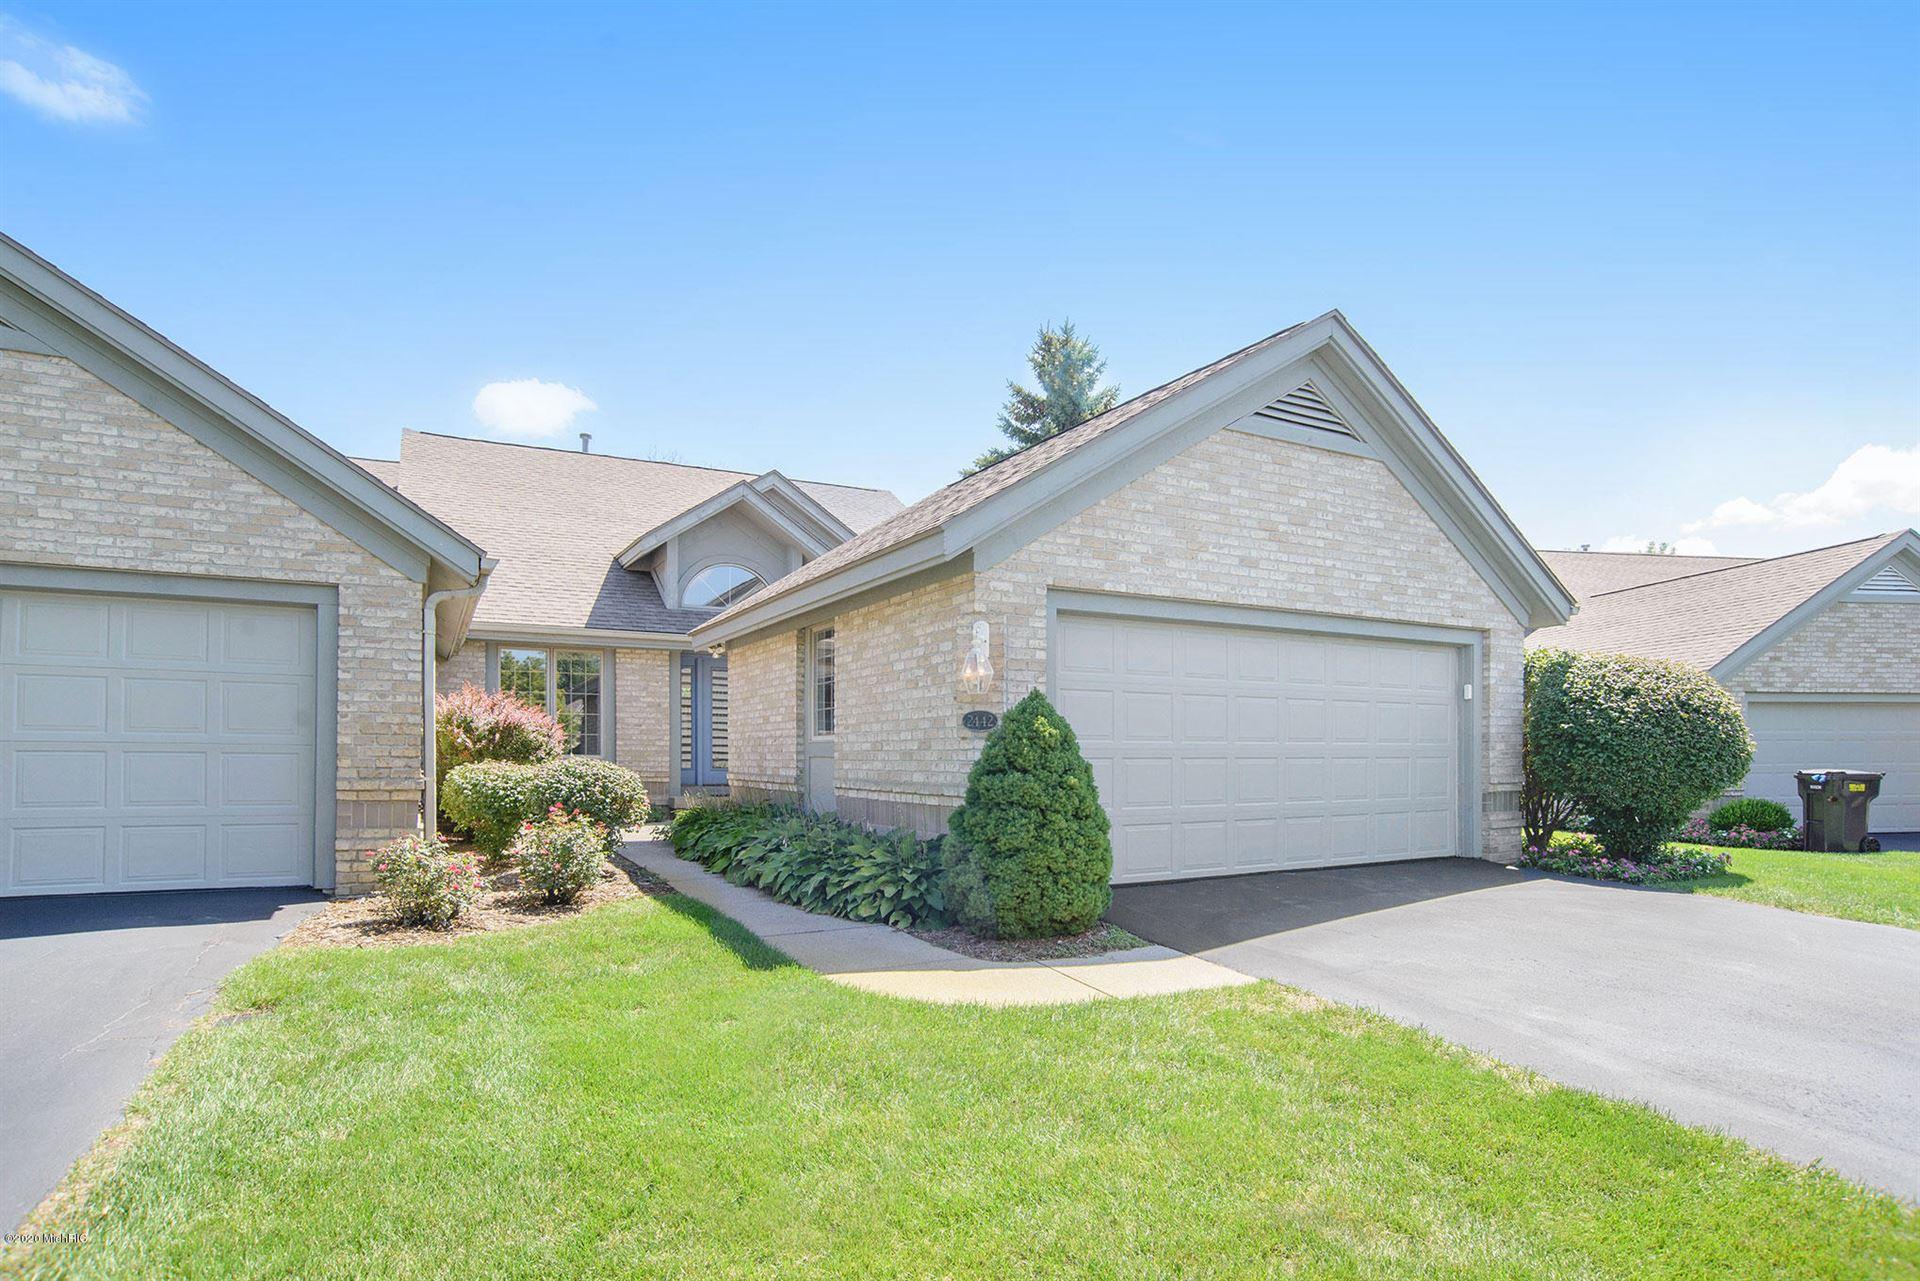 2442 High Ridge Lane SE #23 UNIT 23, Grand Rapids, MI 49546 - MLS#: 20032061